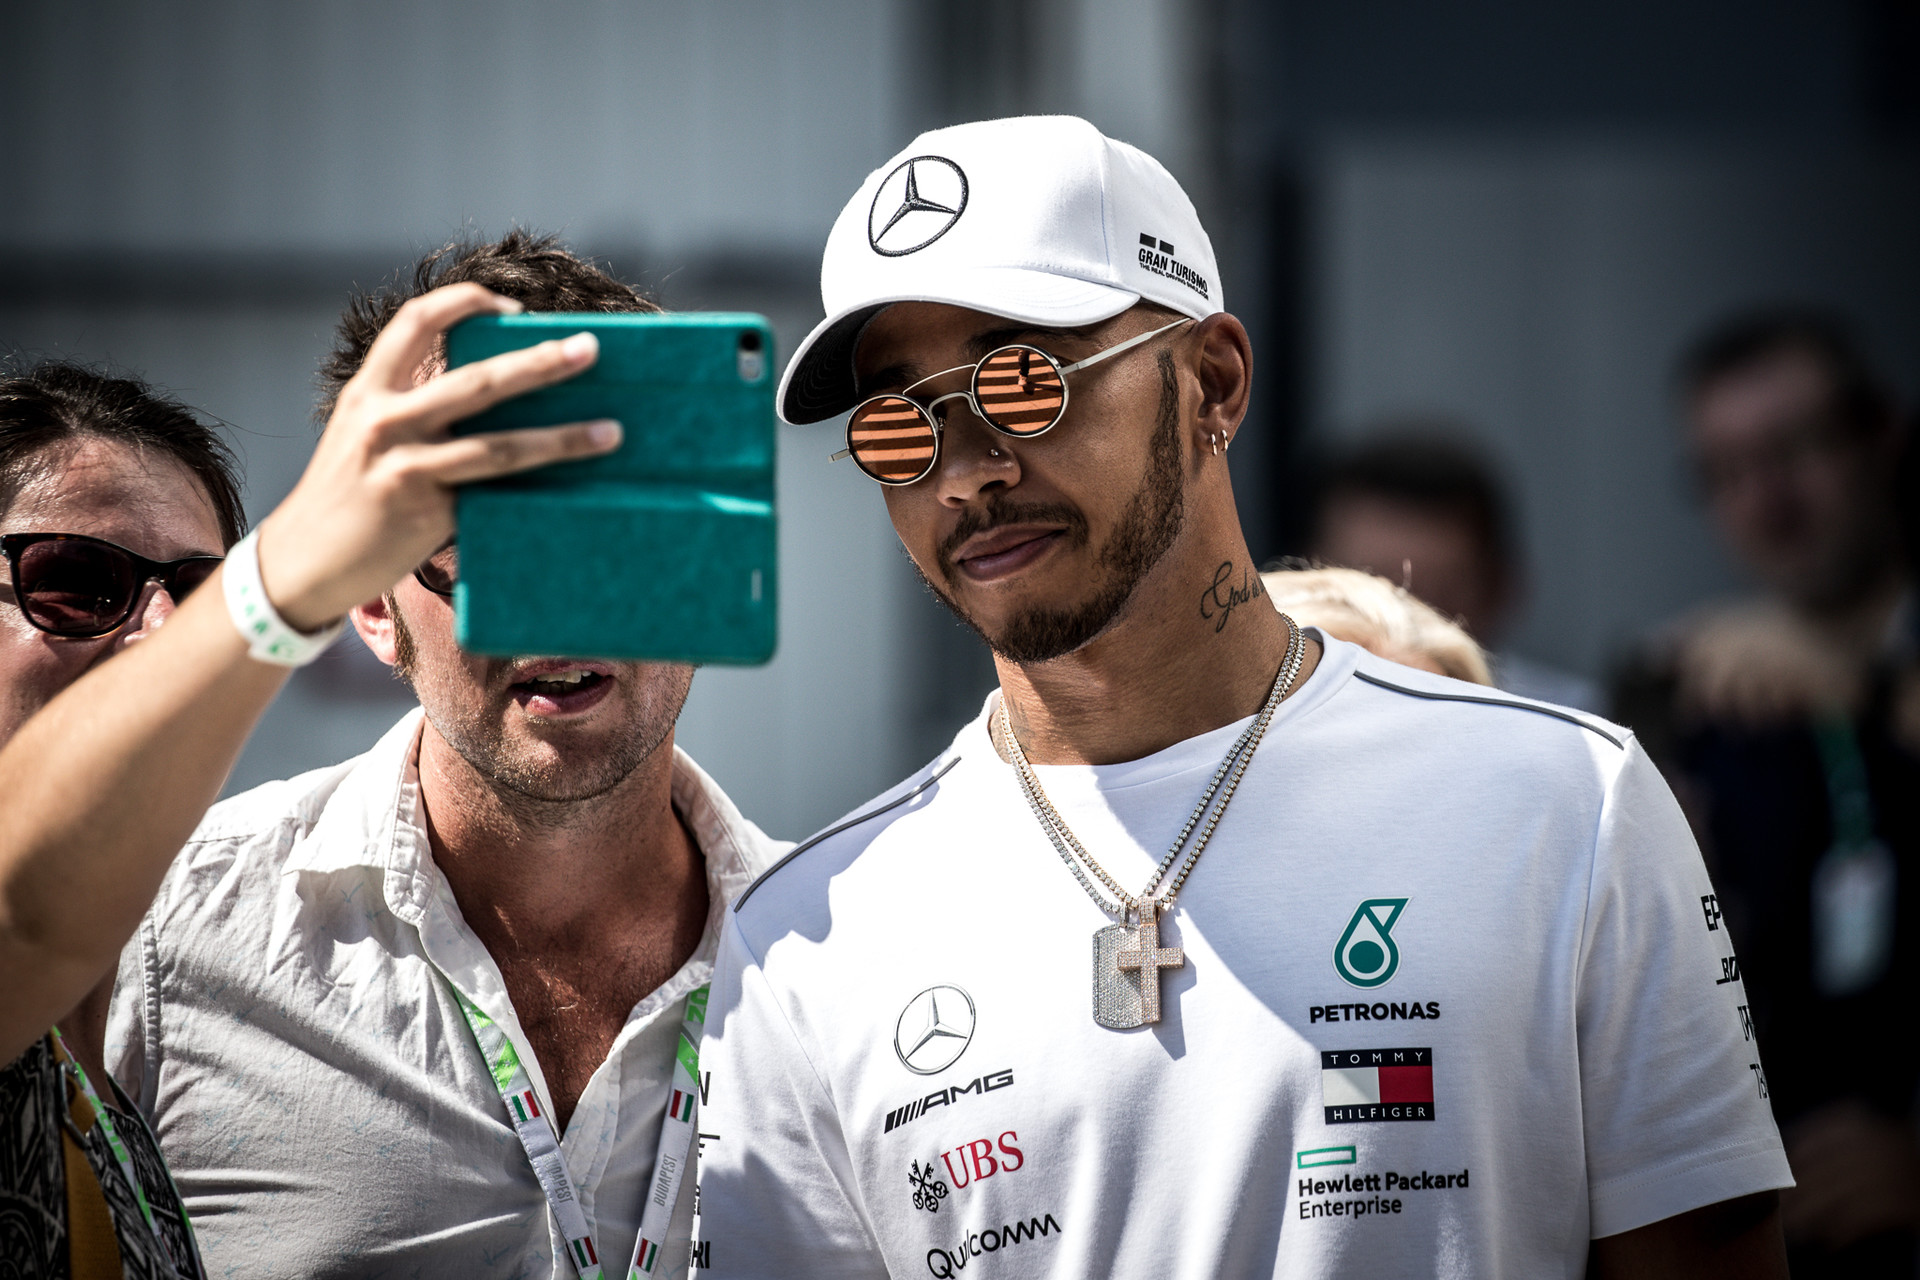 Lewis Hamilton, racingline, racinglinehu, racingline.hu